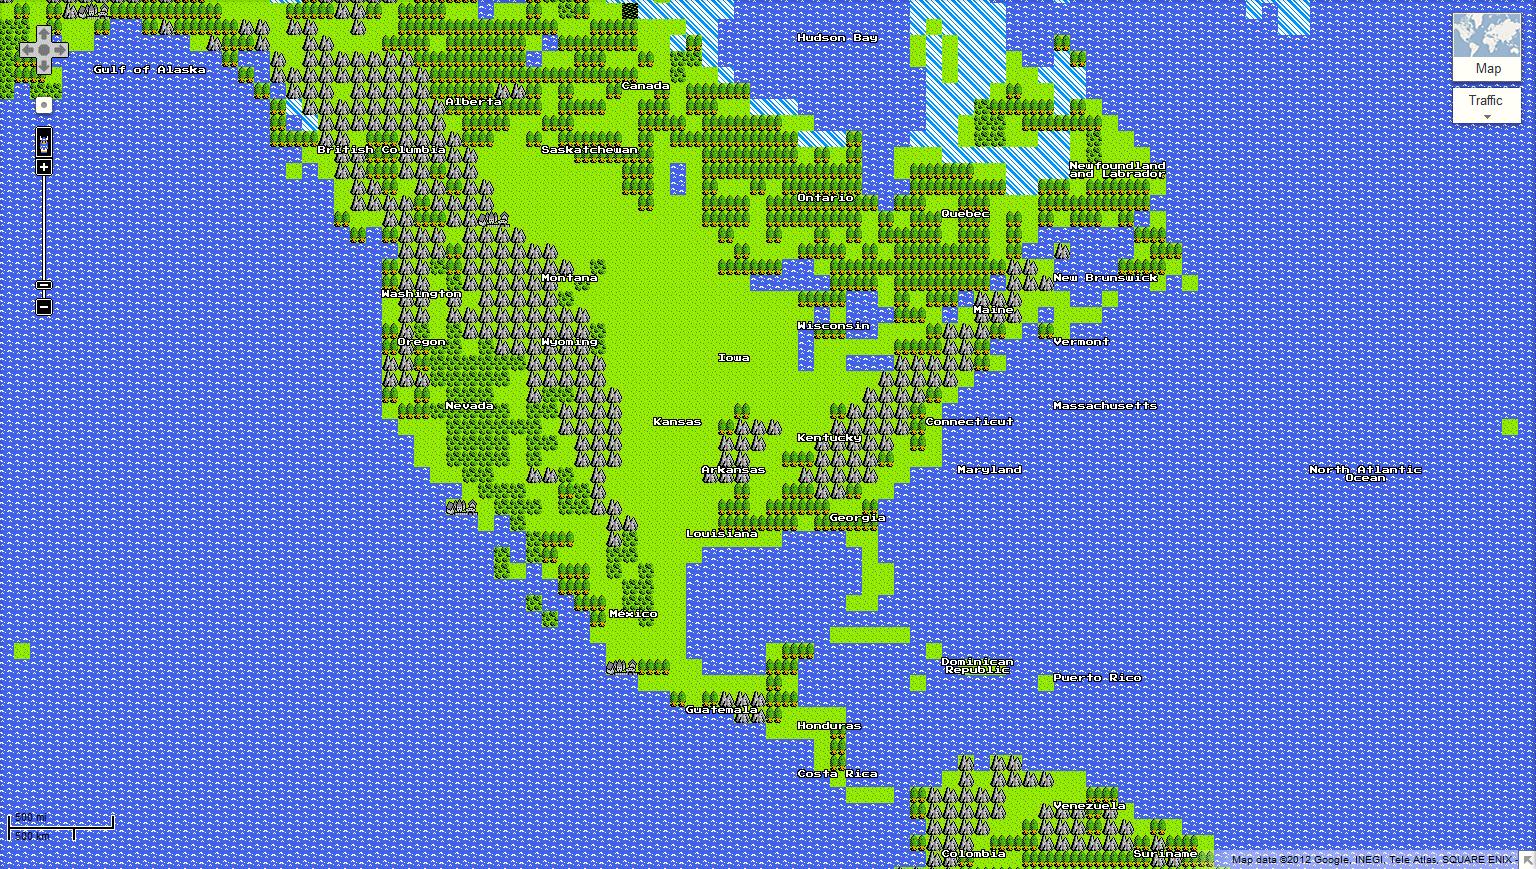 8 bit Google Maps